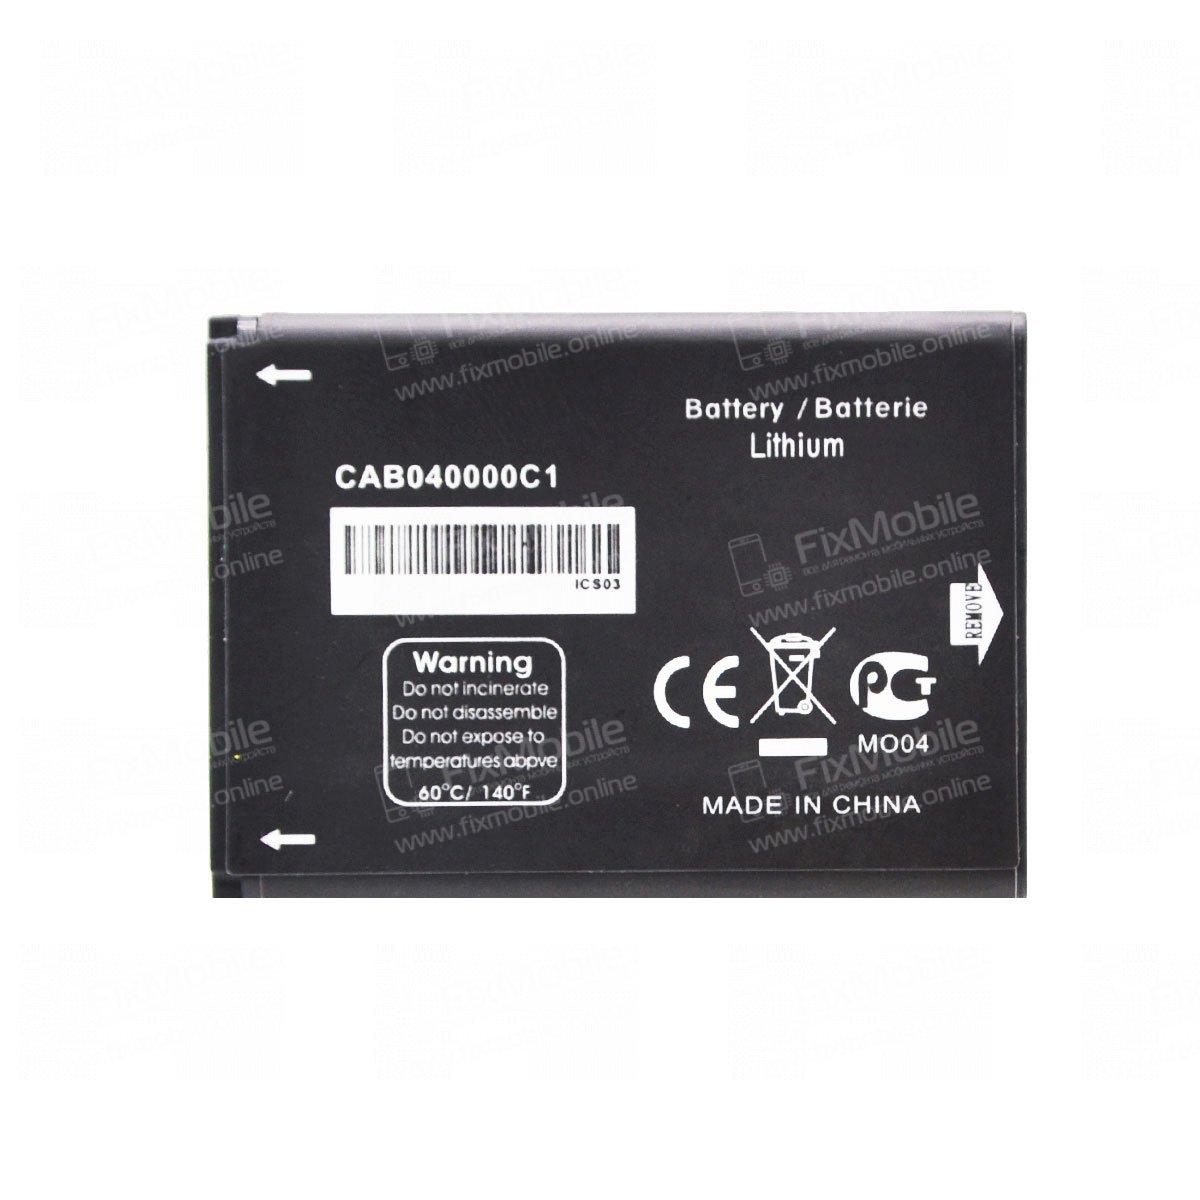 Аккумуляторная батарея для Alcatel One Touch 1035D CAB0400000C1